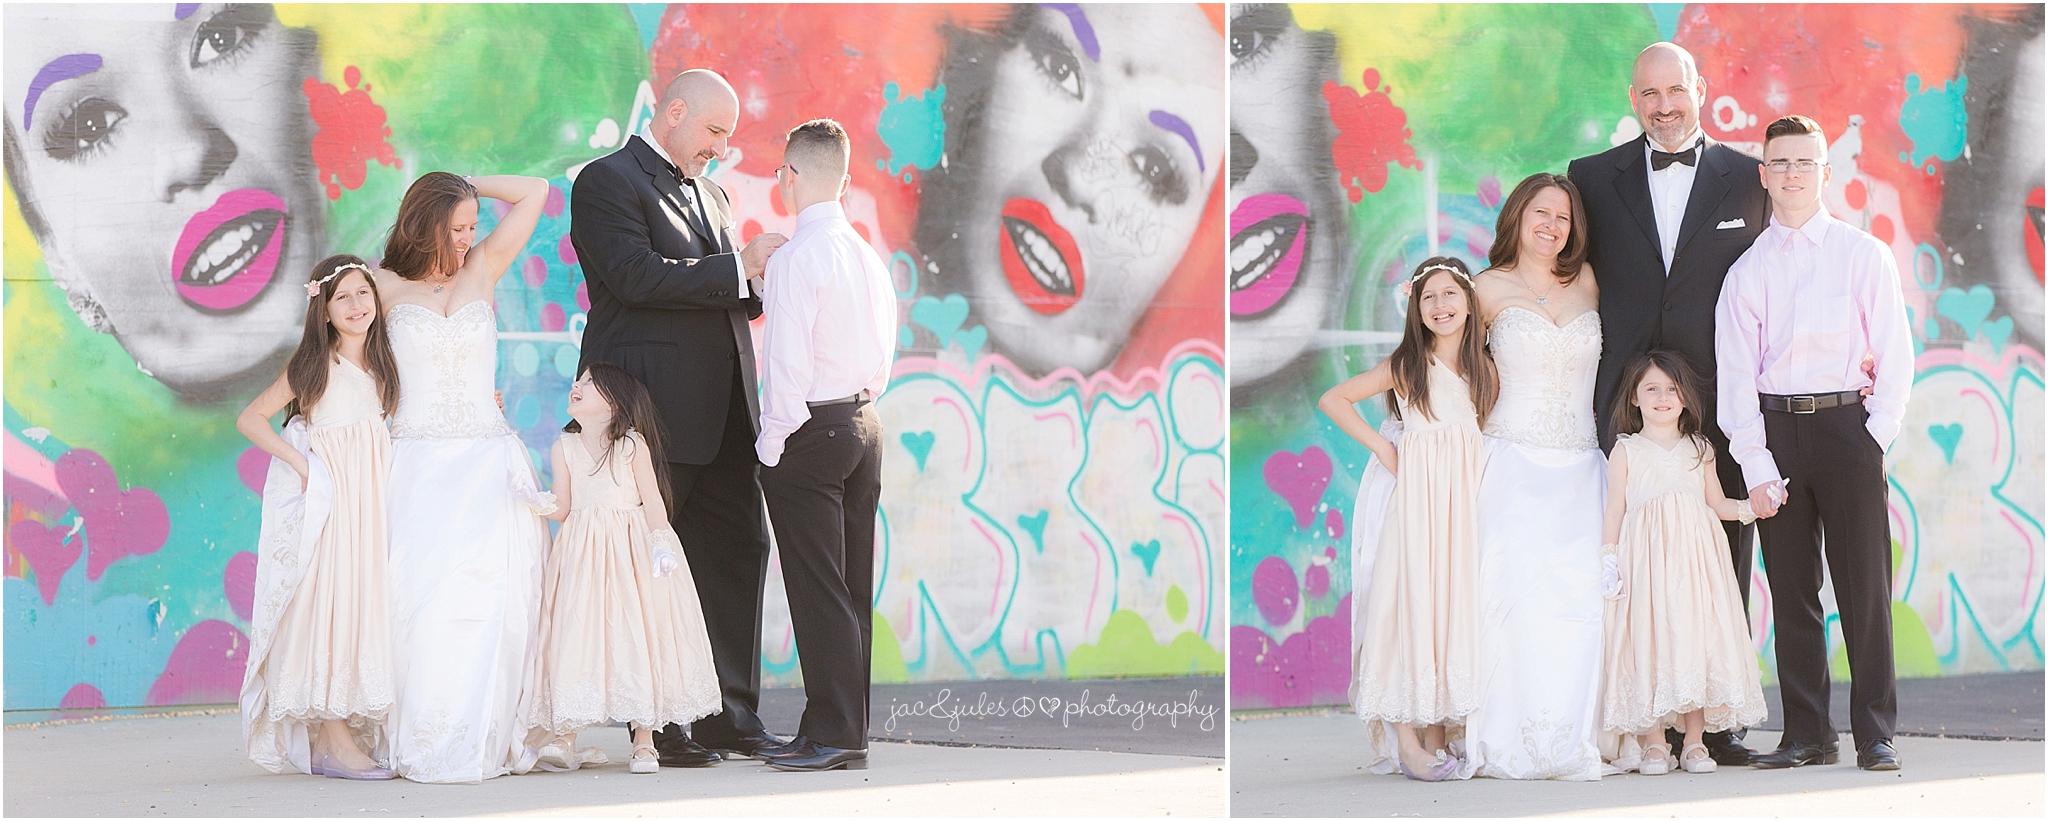 jacnjules photographs wedding anniversary in Asbury NJ